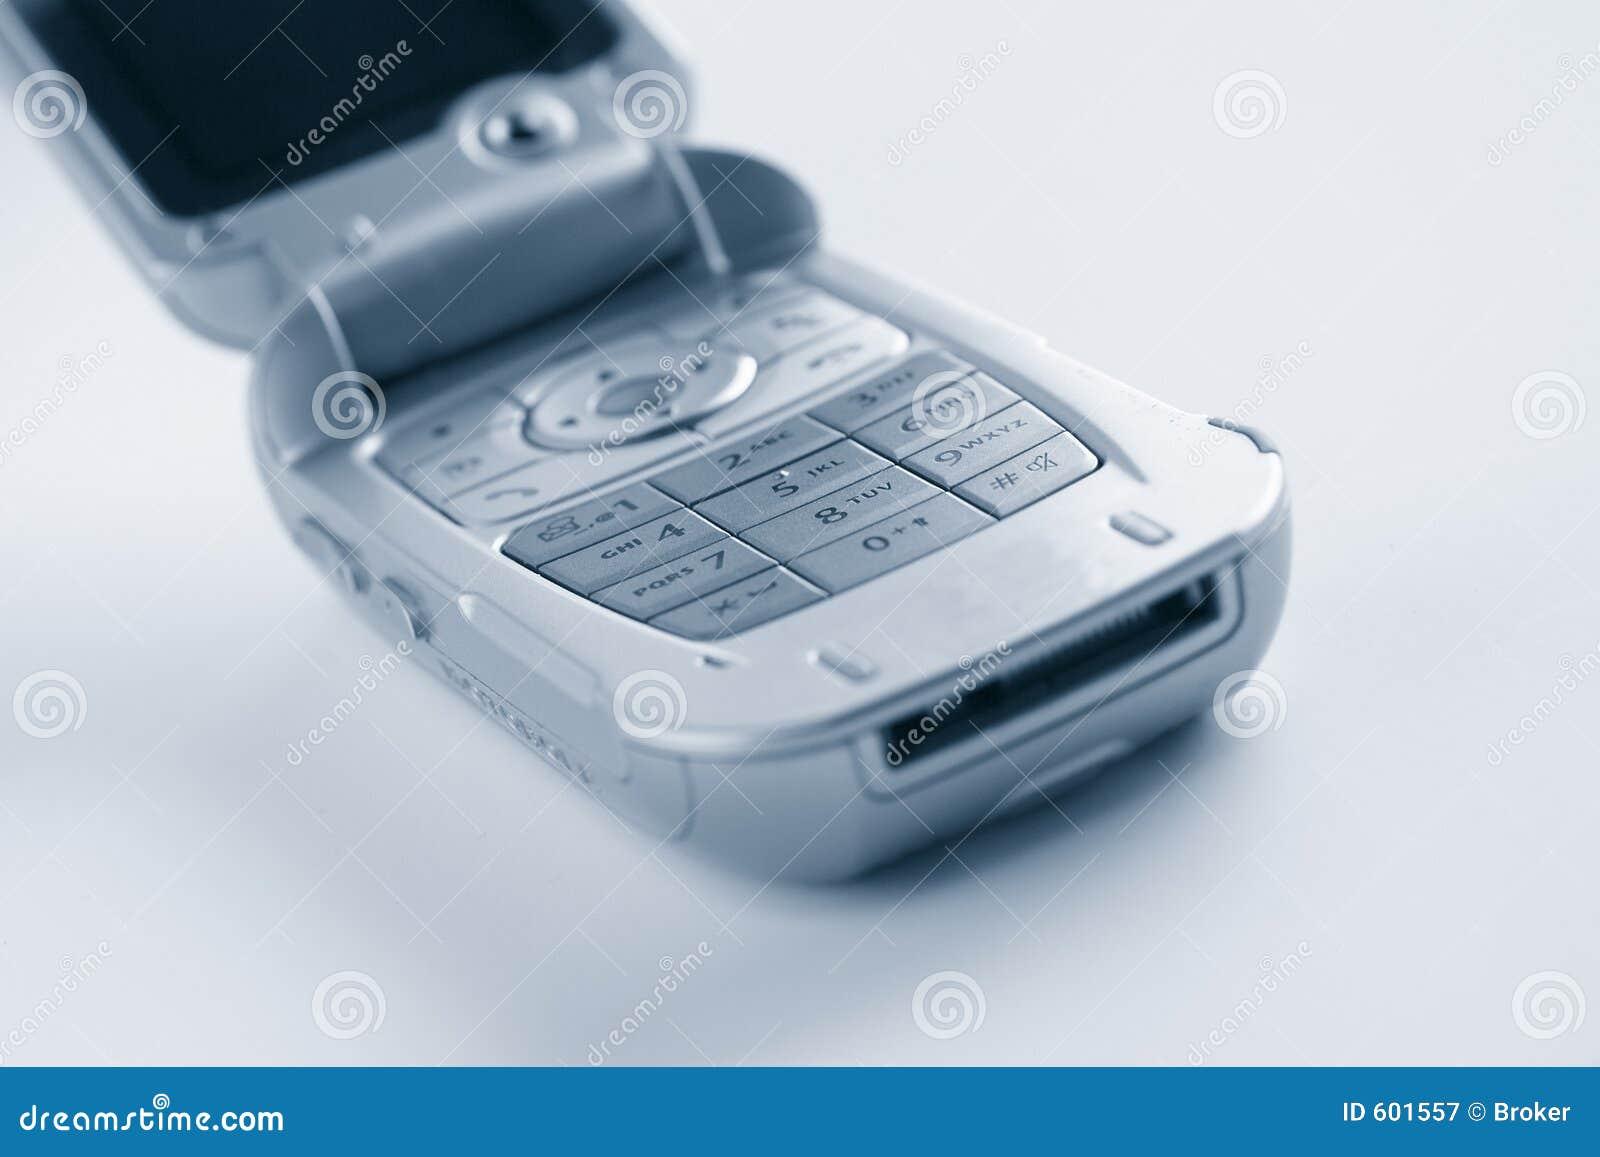 Cell phone key locator